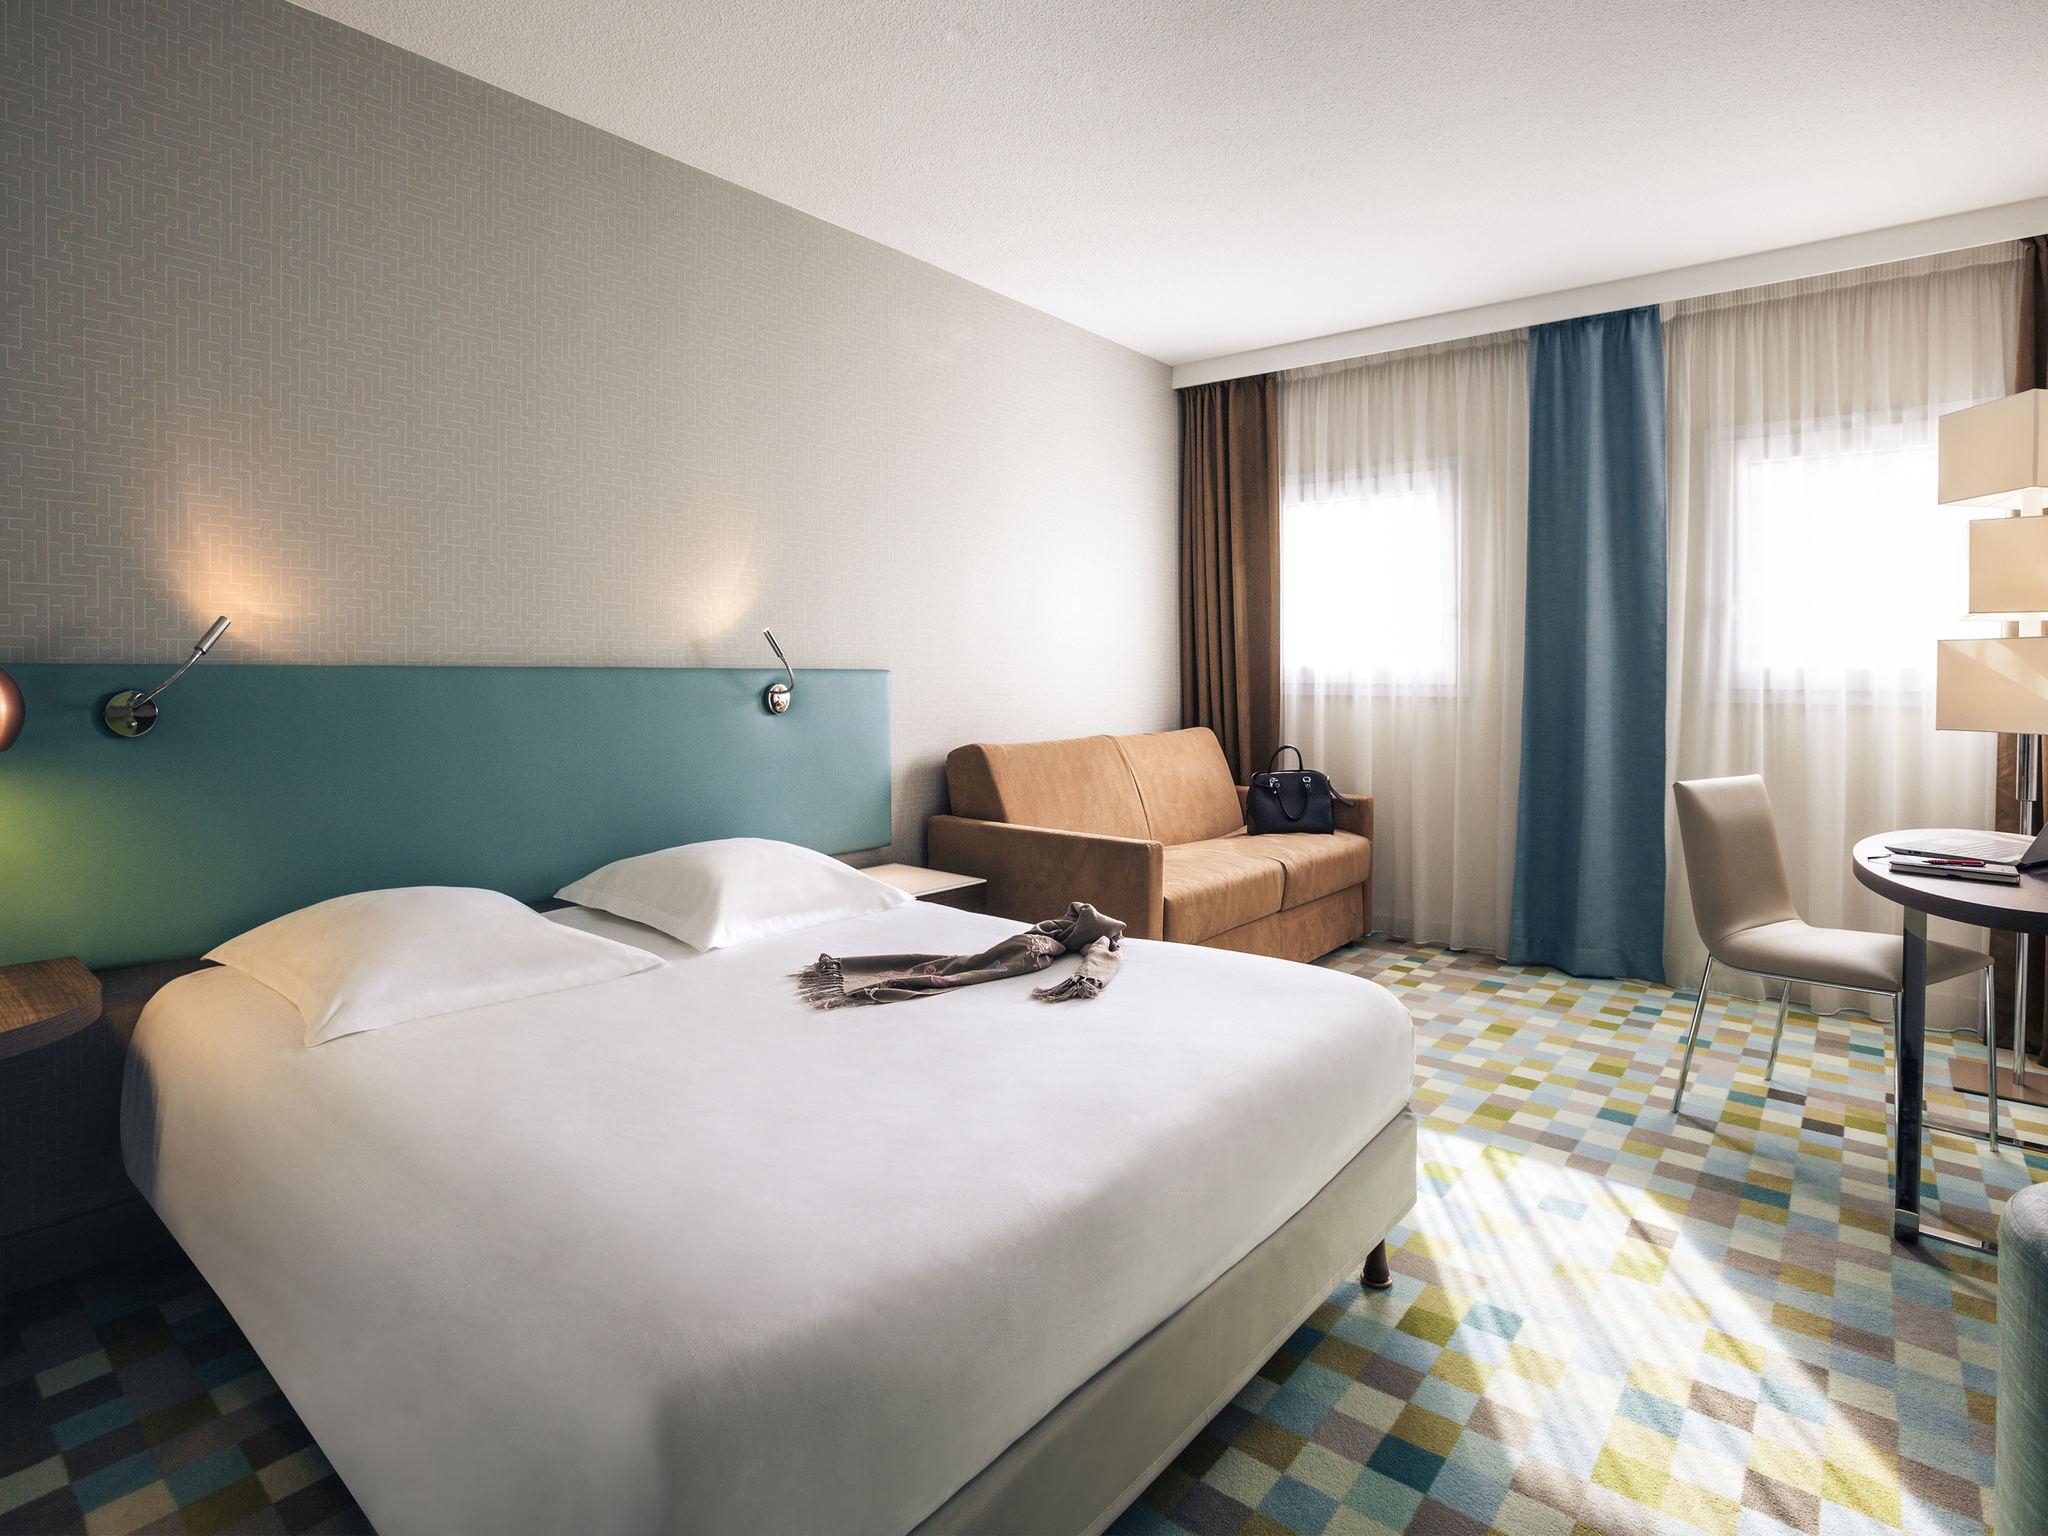 Отель — Hôtel Mercure Marne-la-Vallée Bussy-Saint-Georges